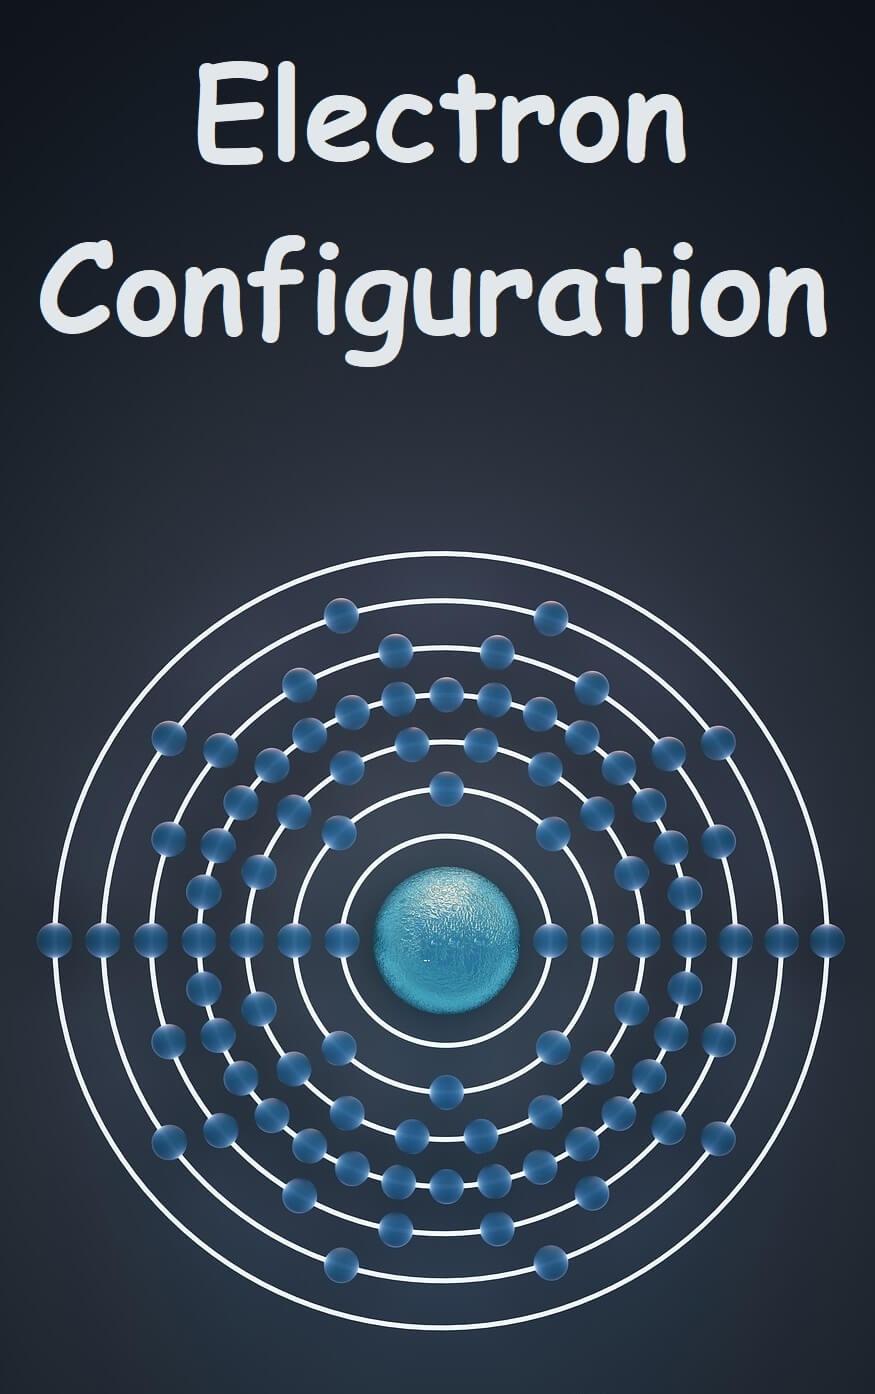 electron configuration of elements